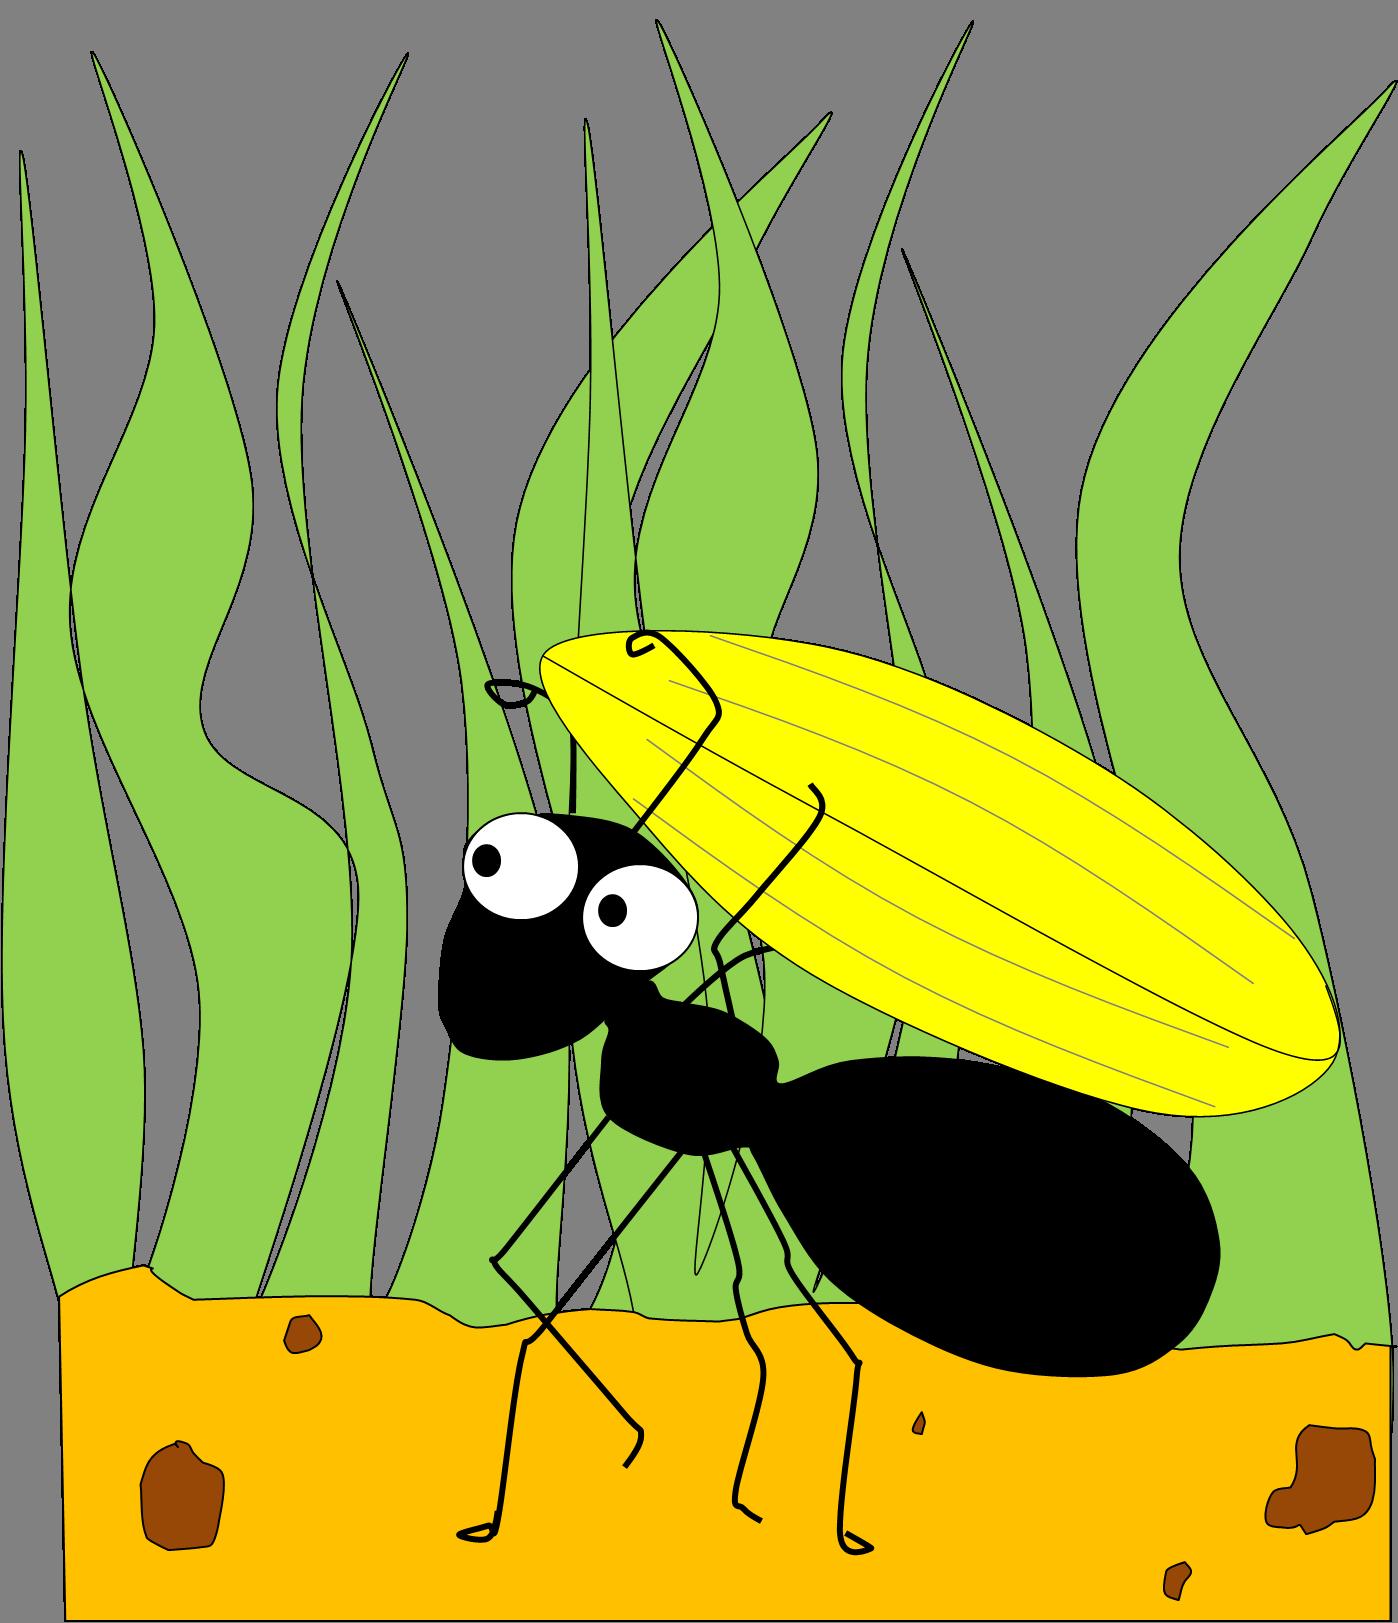 grasshopper-clipart-LcKd99AMi.png